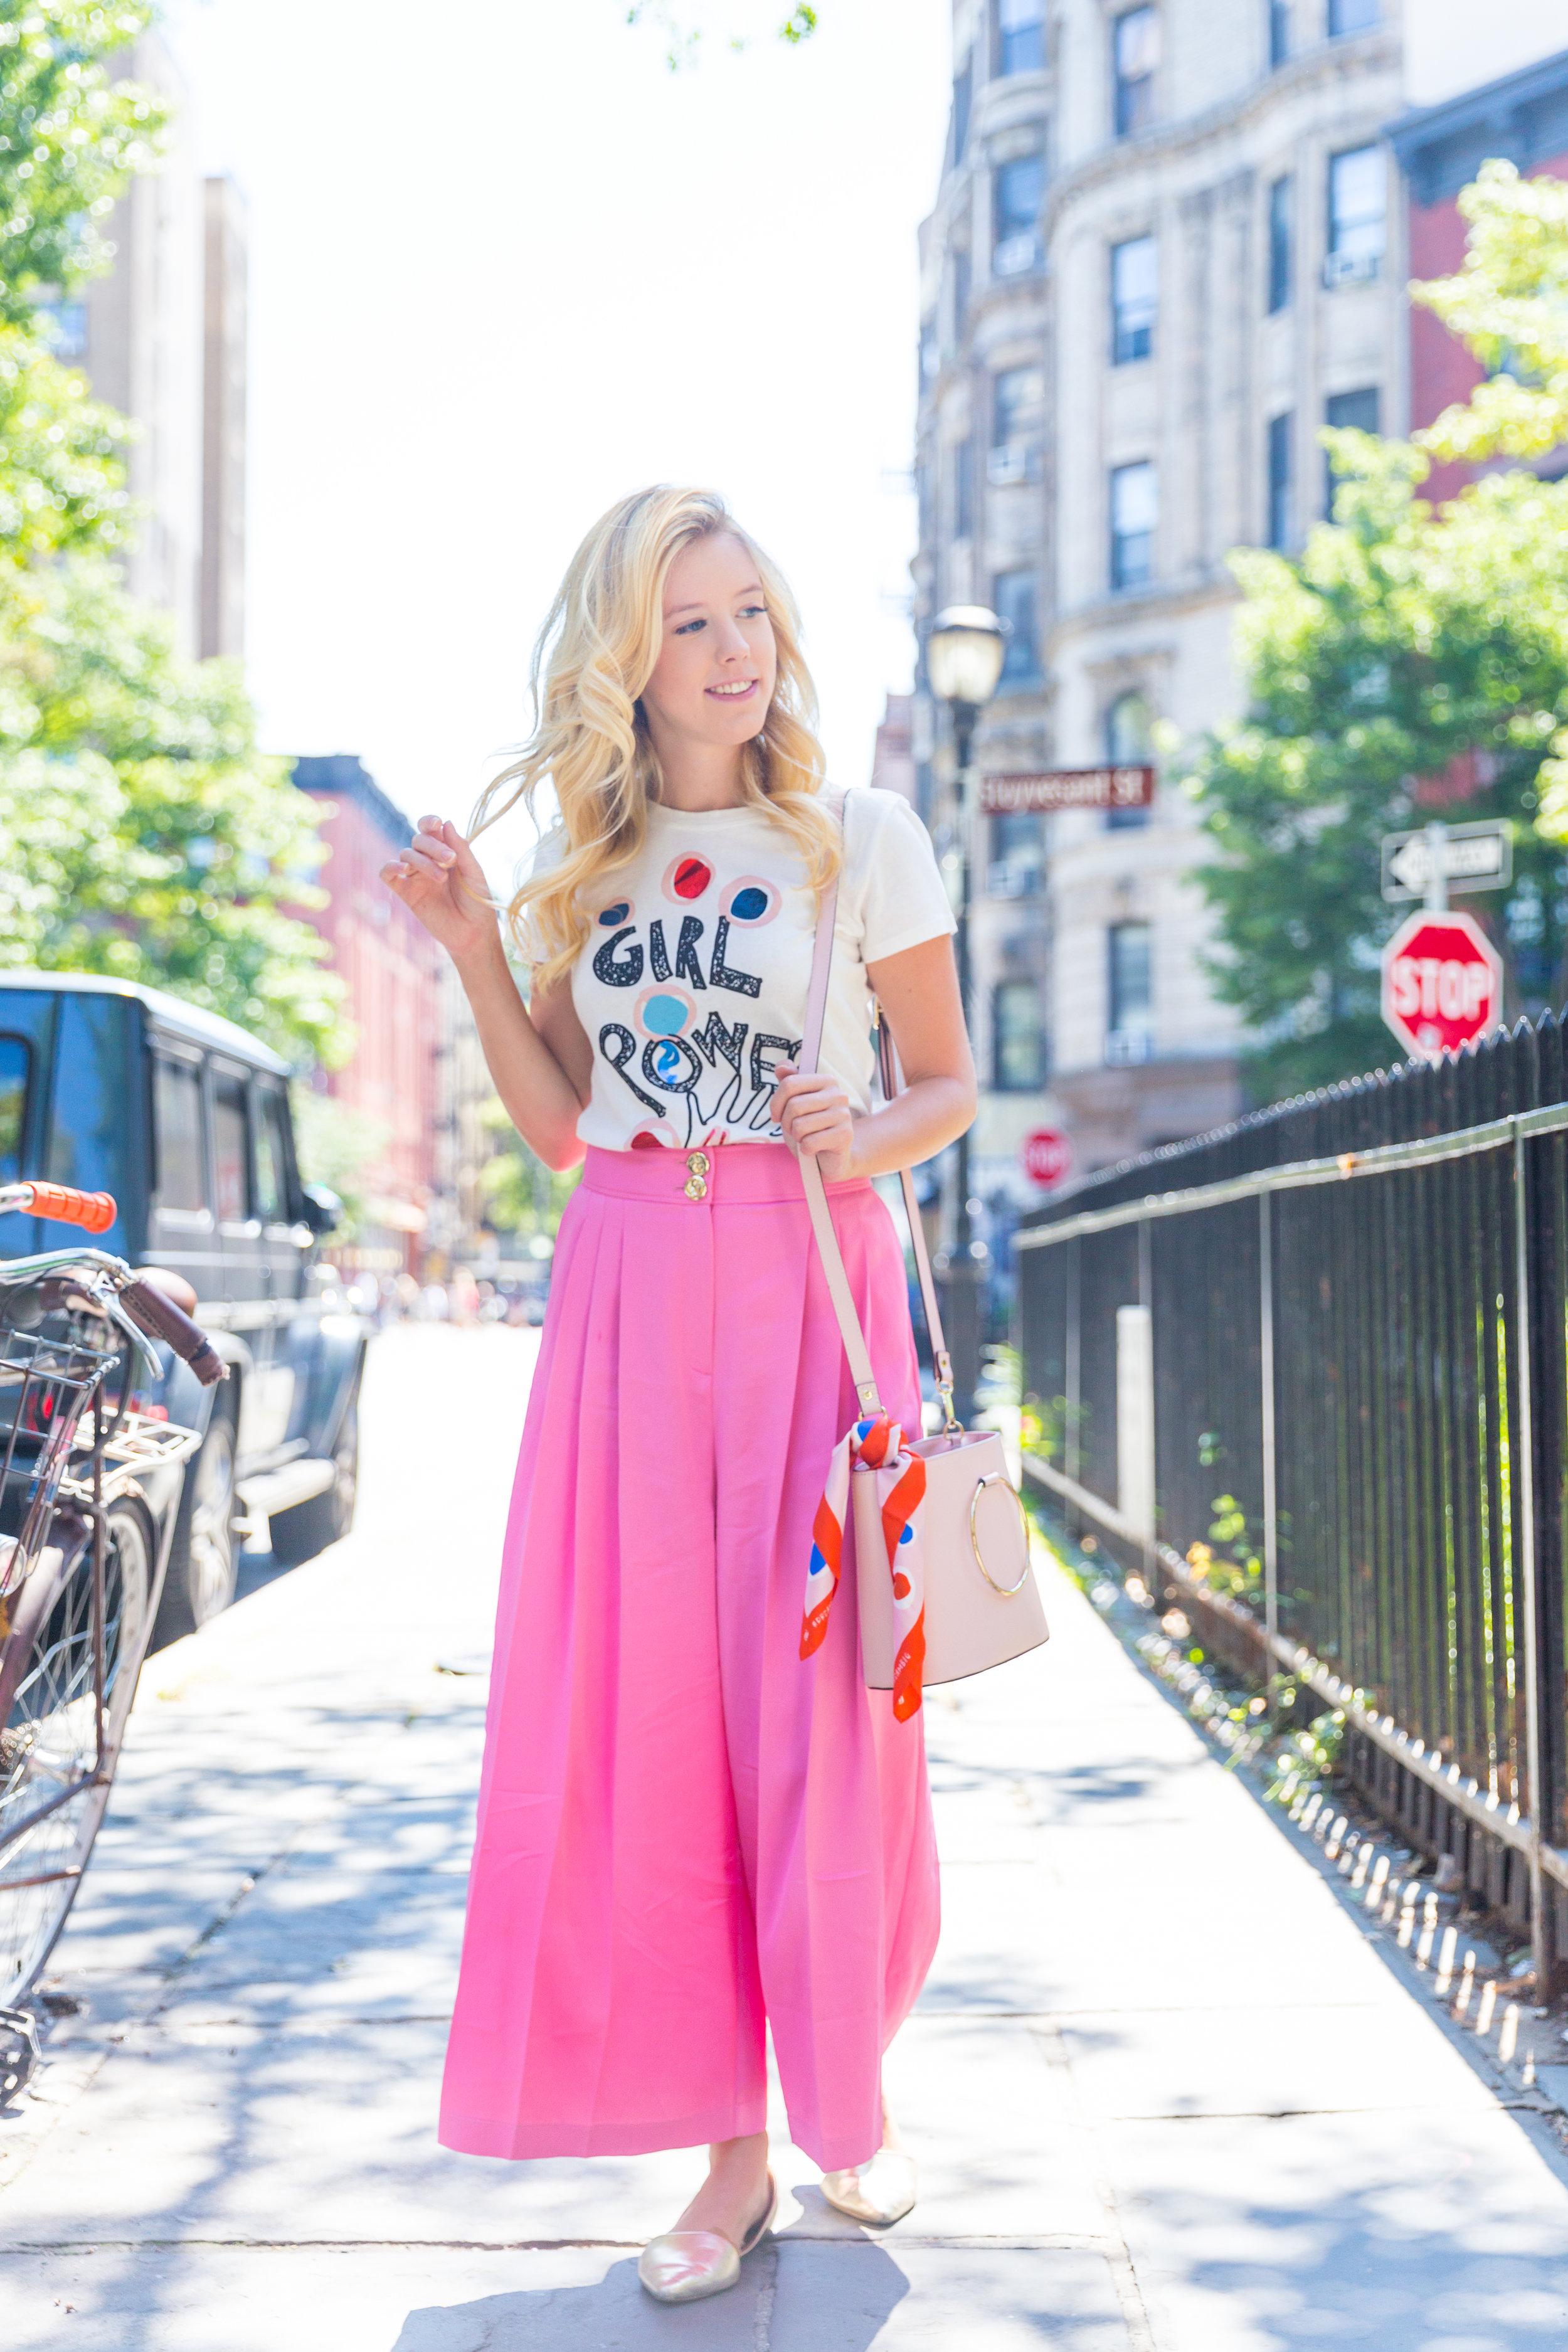 Summer Ethical Fashion NYC Pink Pants Girl Power Shirt-4.jpg